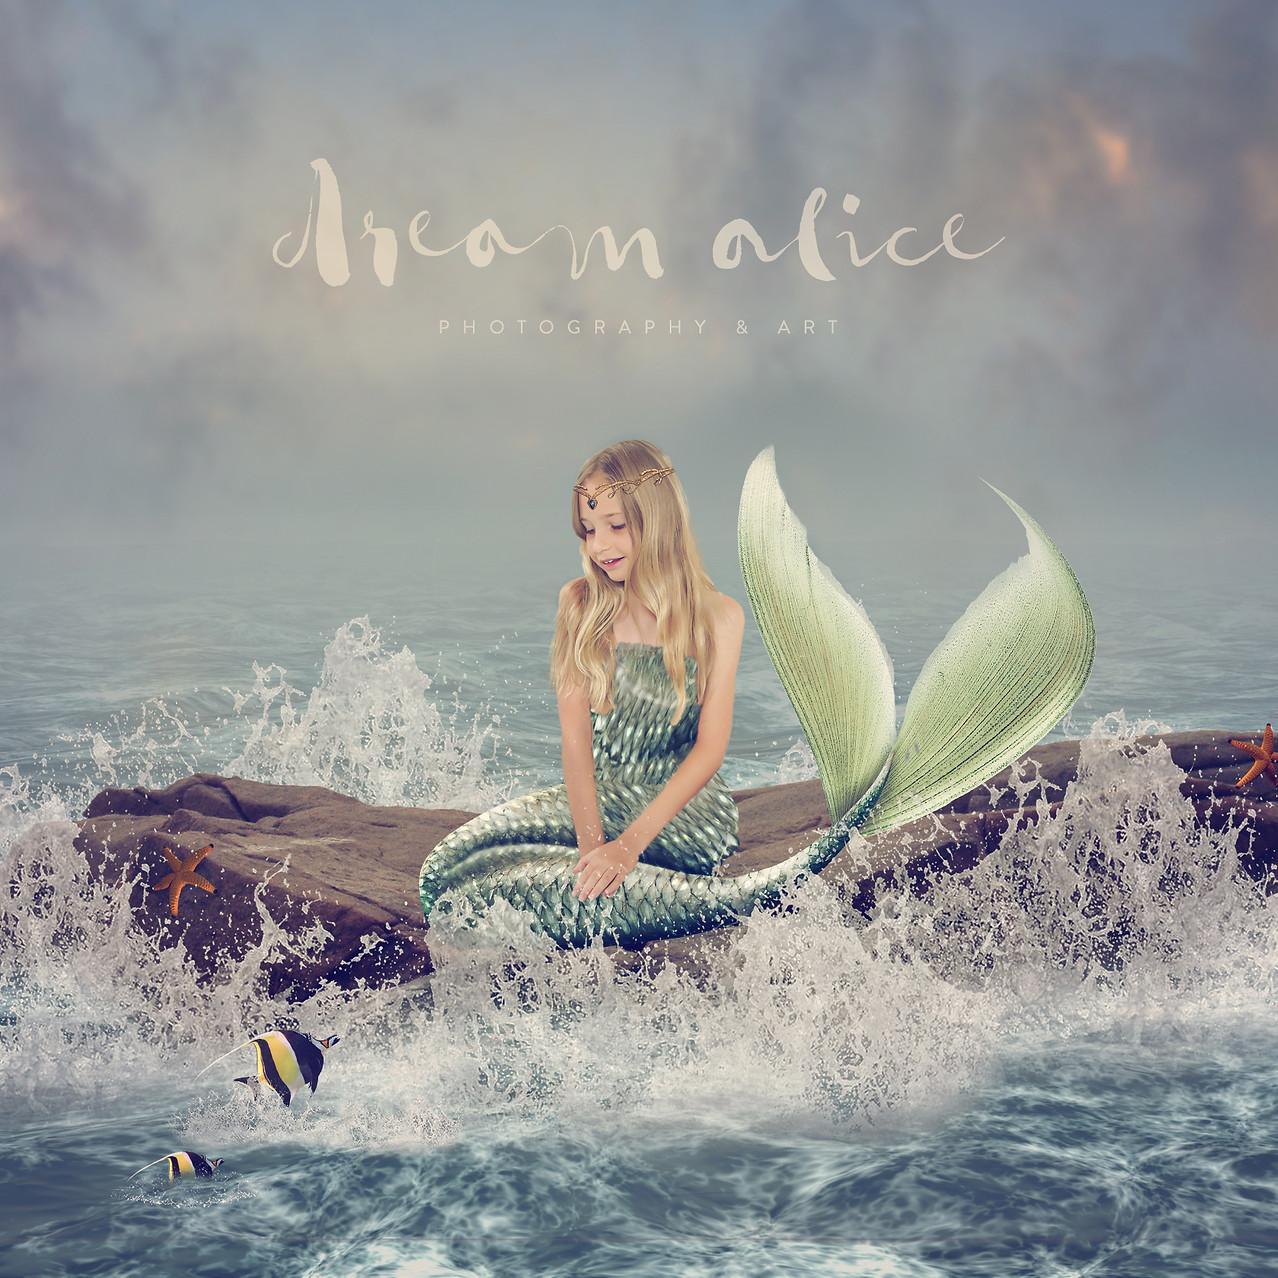 Mermaid Rock. Creative Children's Photography fantasy photoshoot, Dream Alice Photography & Art, Gold Coast